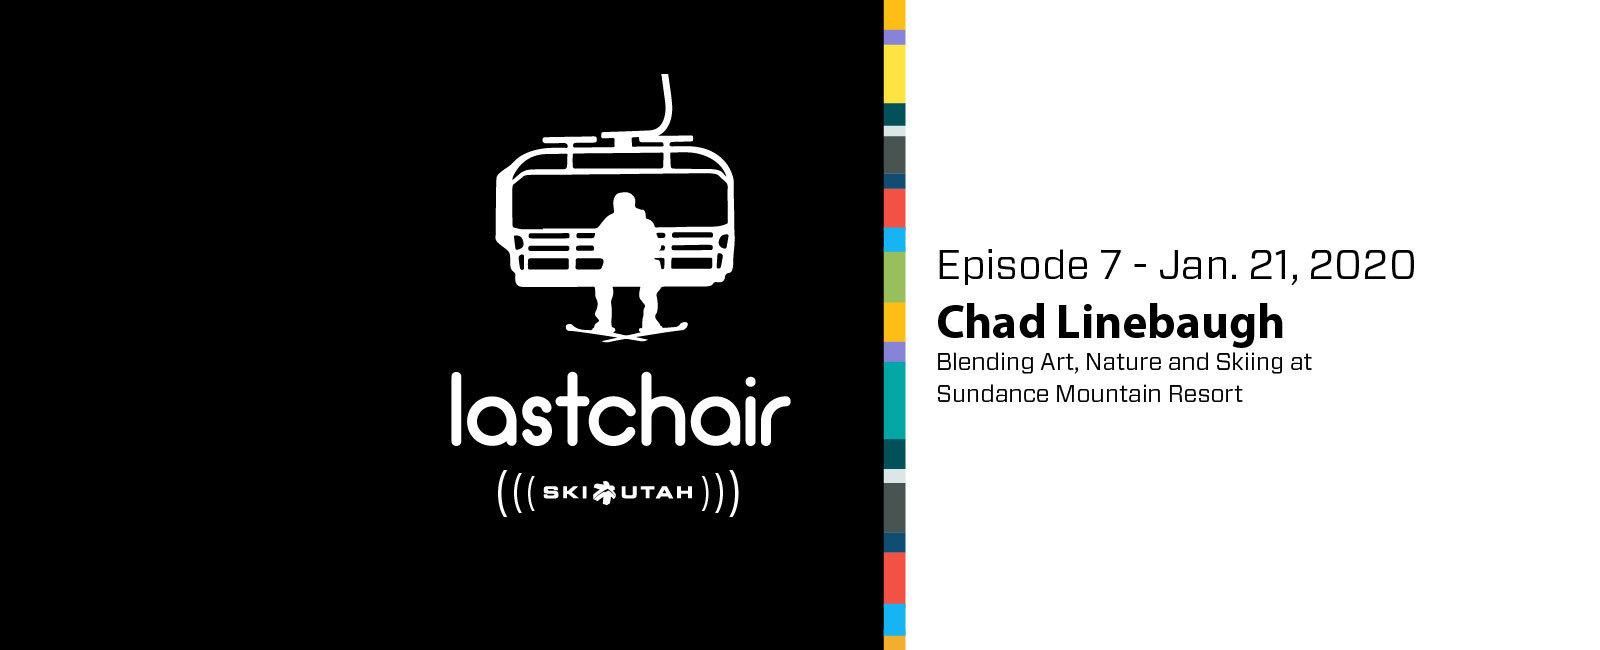 Chad Linebaugh: Blending Art, Nature and Skiing at Sundance Mountain Resort